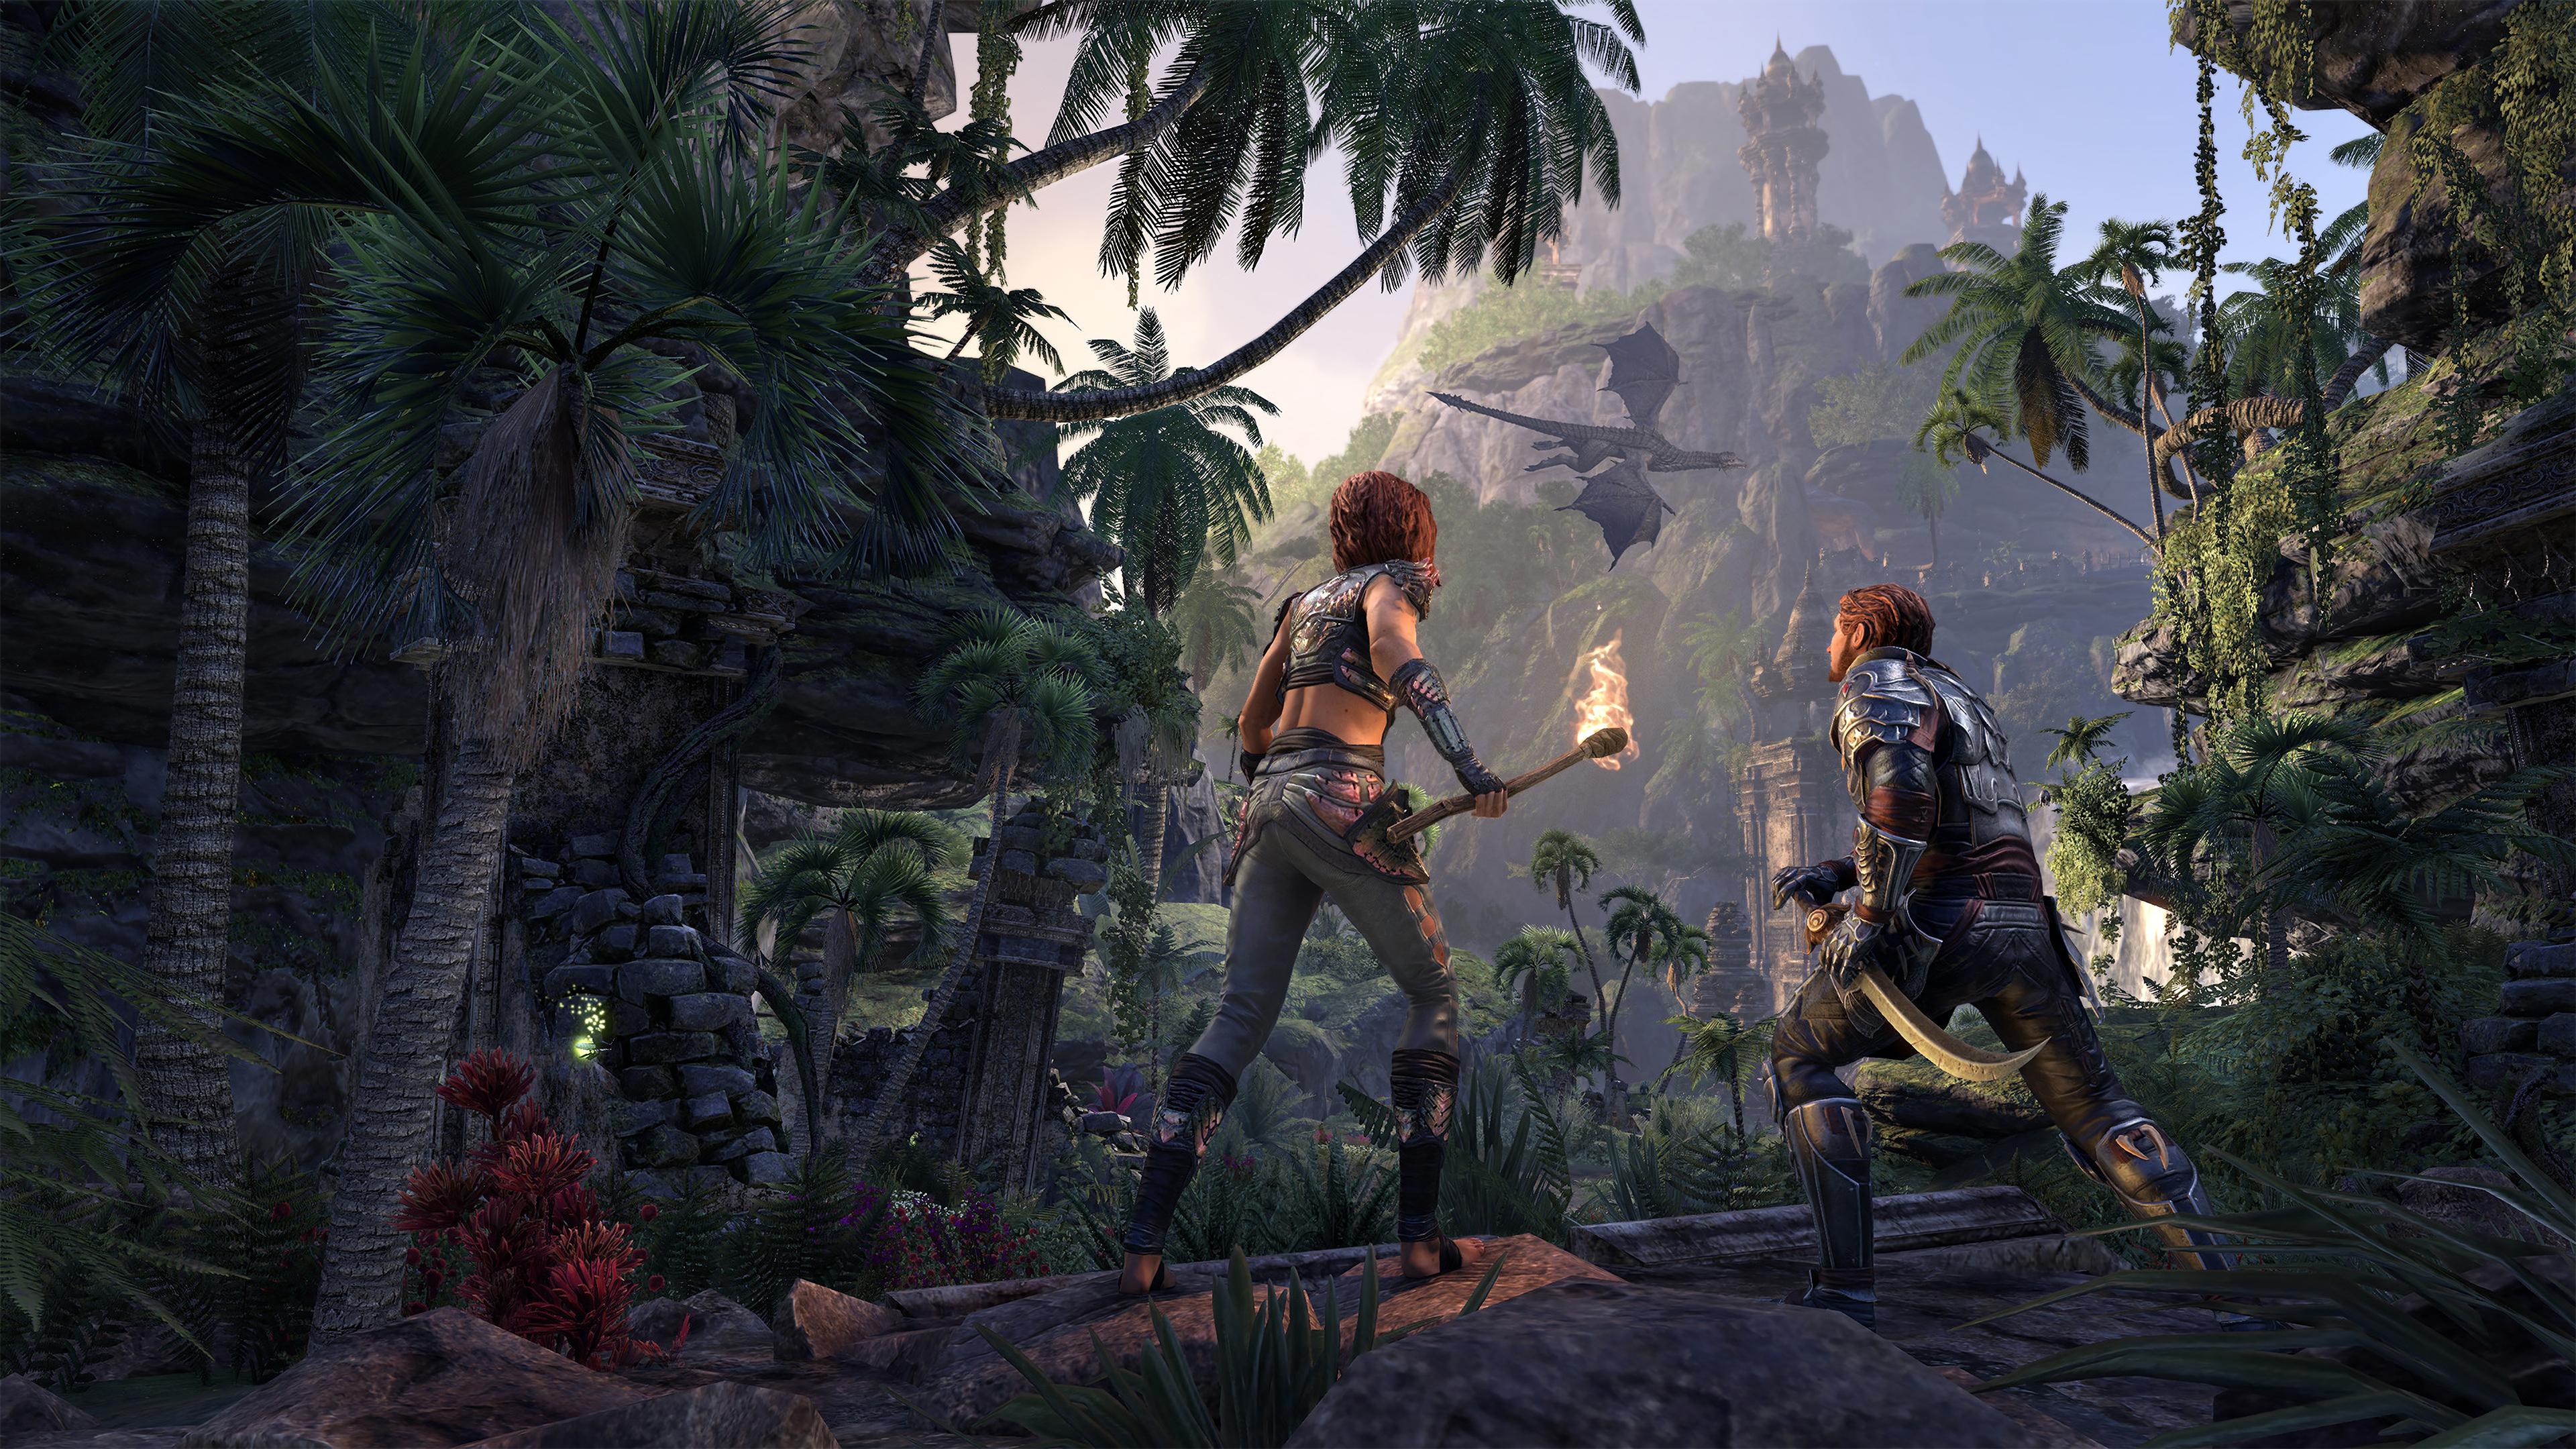 320x240 2019 The Elder Scrolls Online Elsweyr Video Game Apple